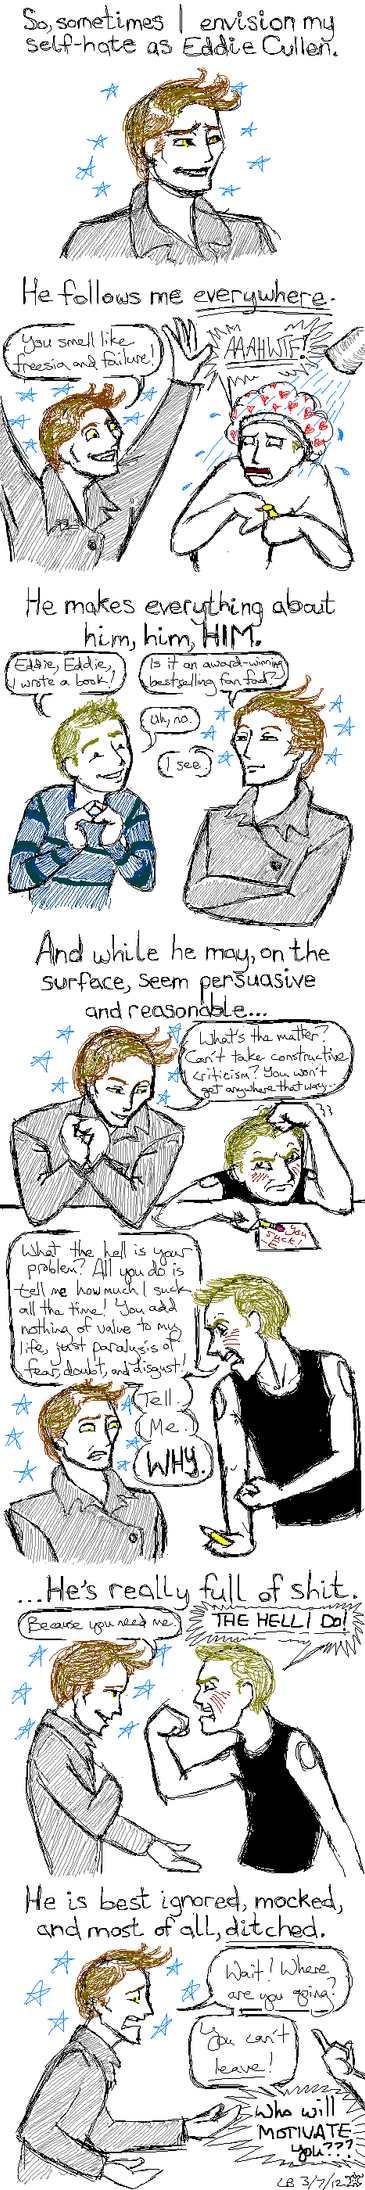 Edward Cullen Adventures pg. 1 by BaaingTree